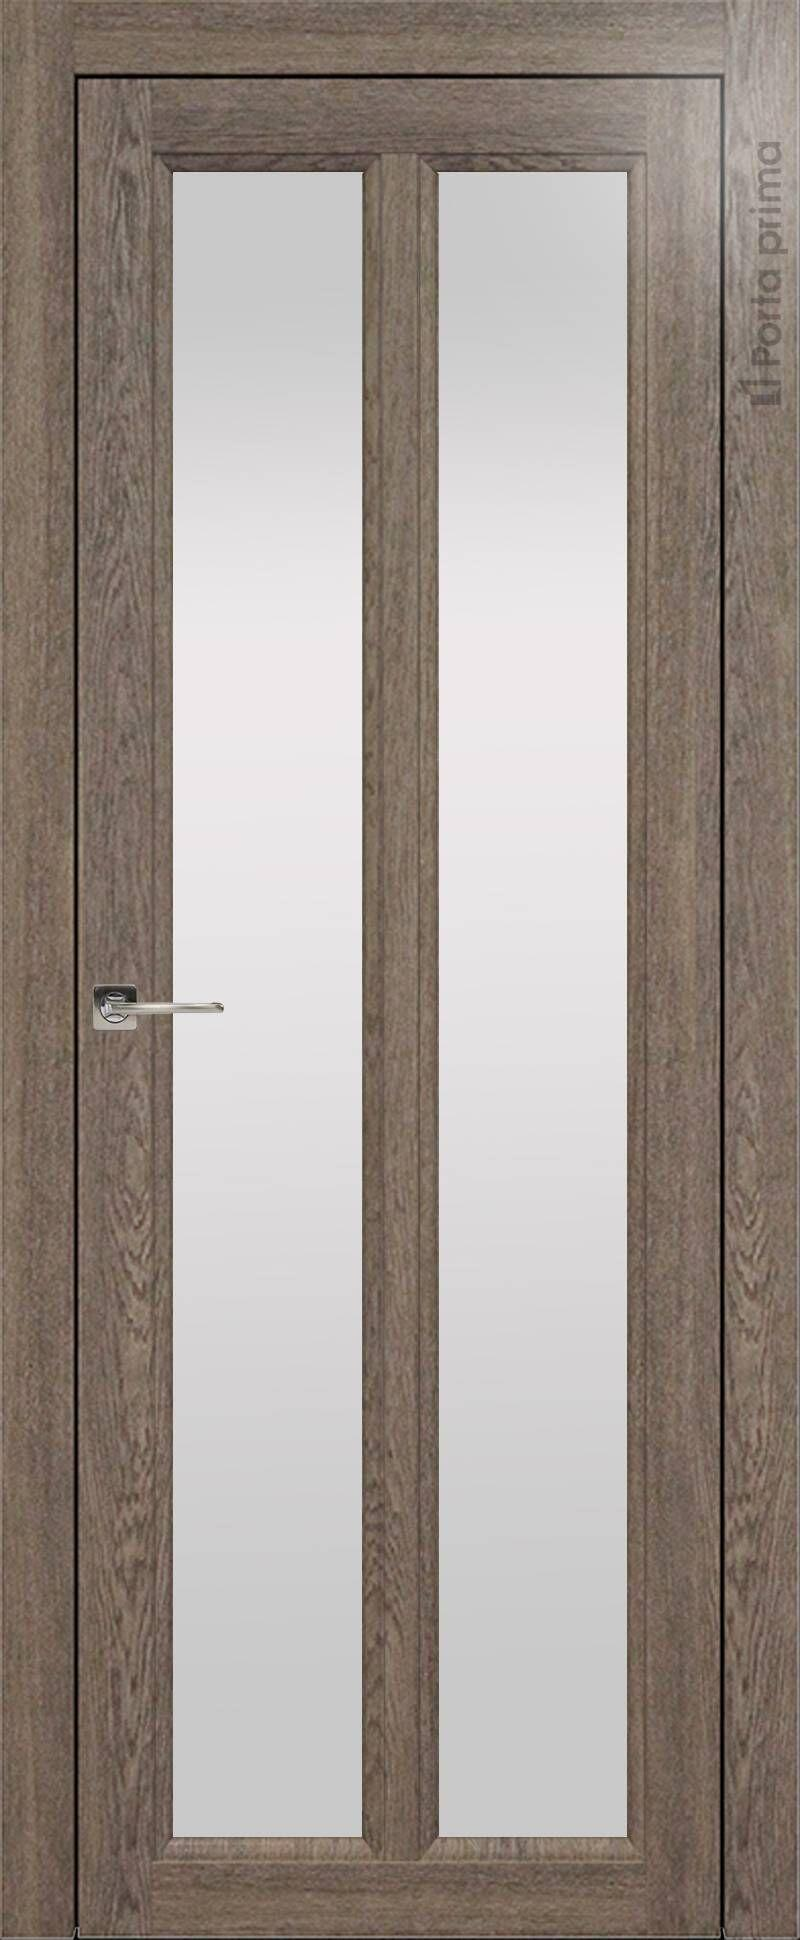 Sorrento-R Д4 цвет - Дуб антик Со стеклом (ДО)